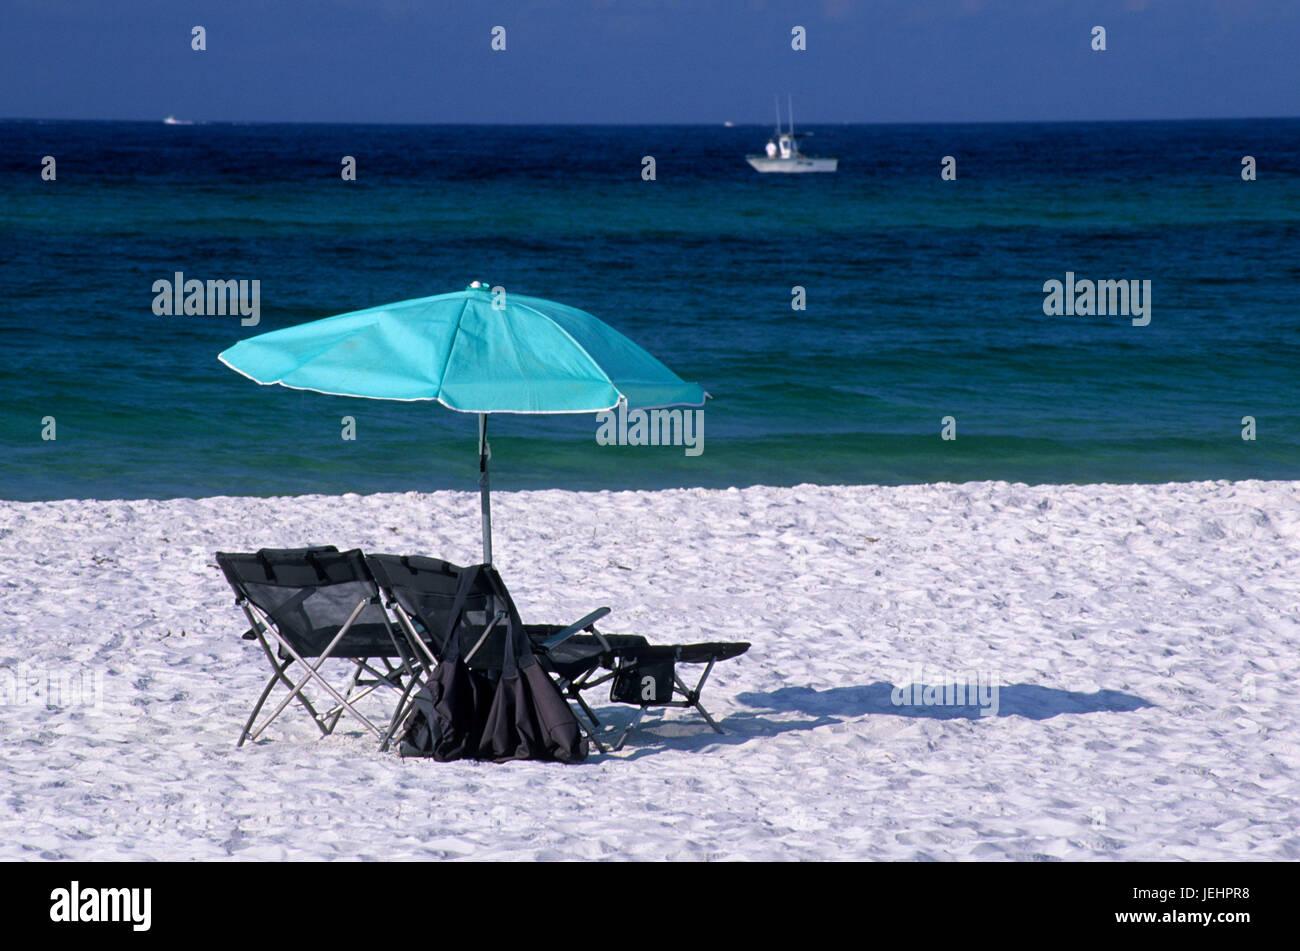 Langdon Beach umbrella, Gulf Islands National Seashore, Florida - Stock Image